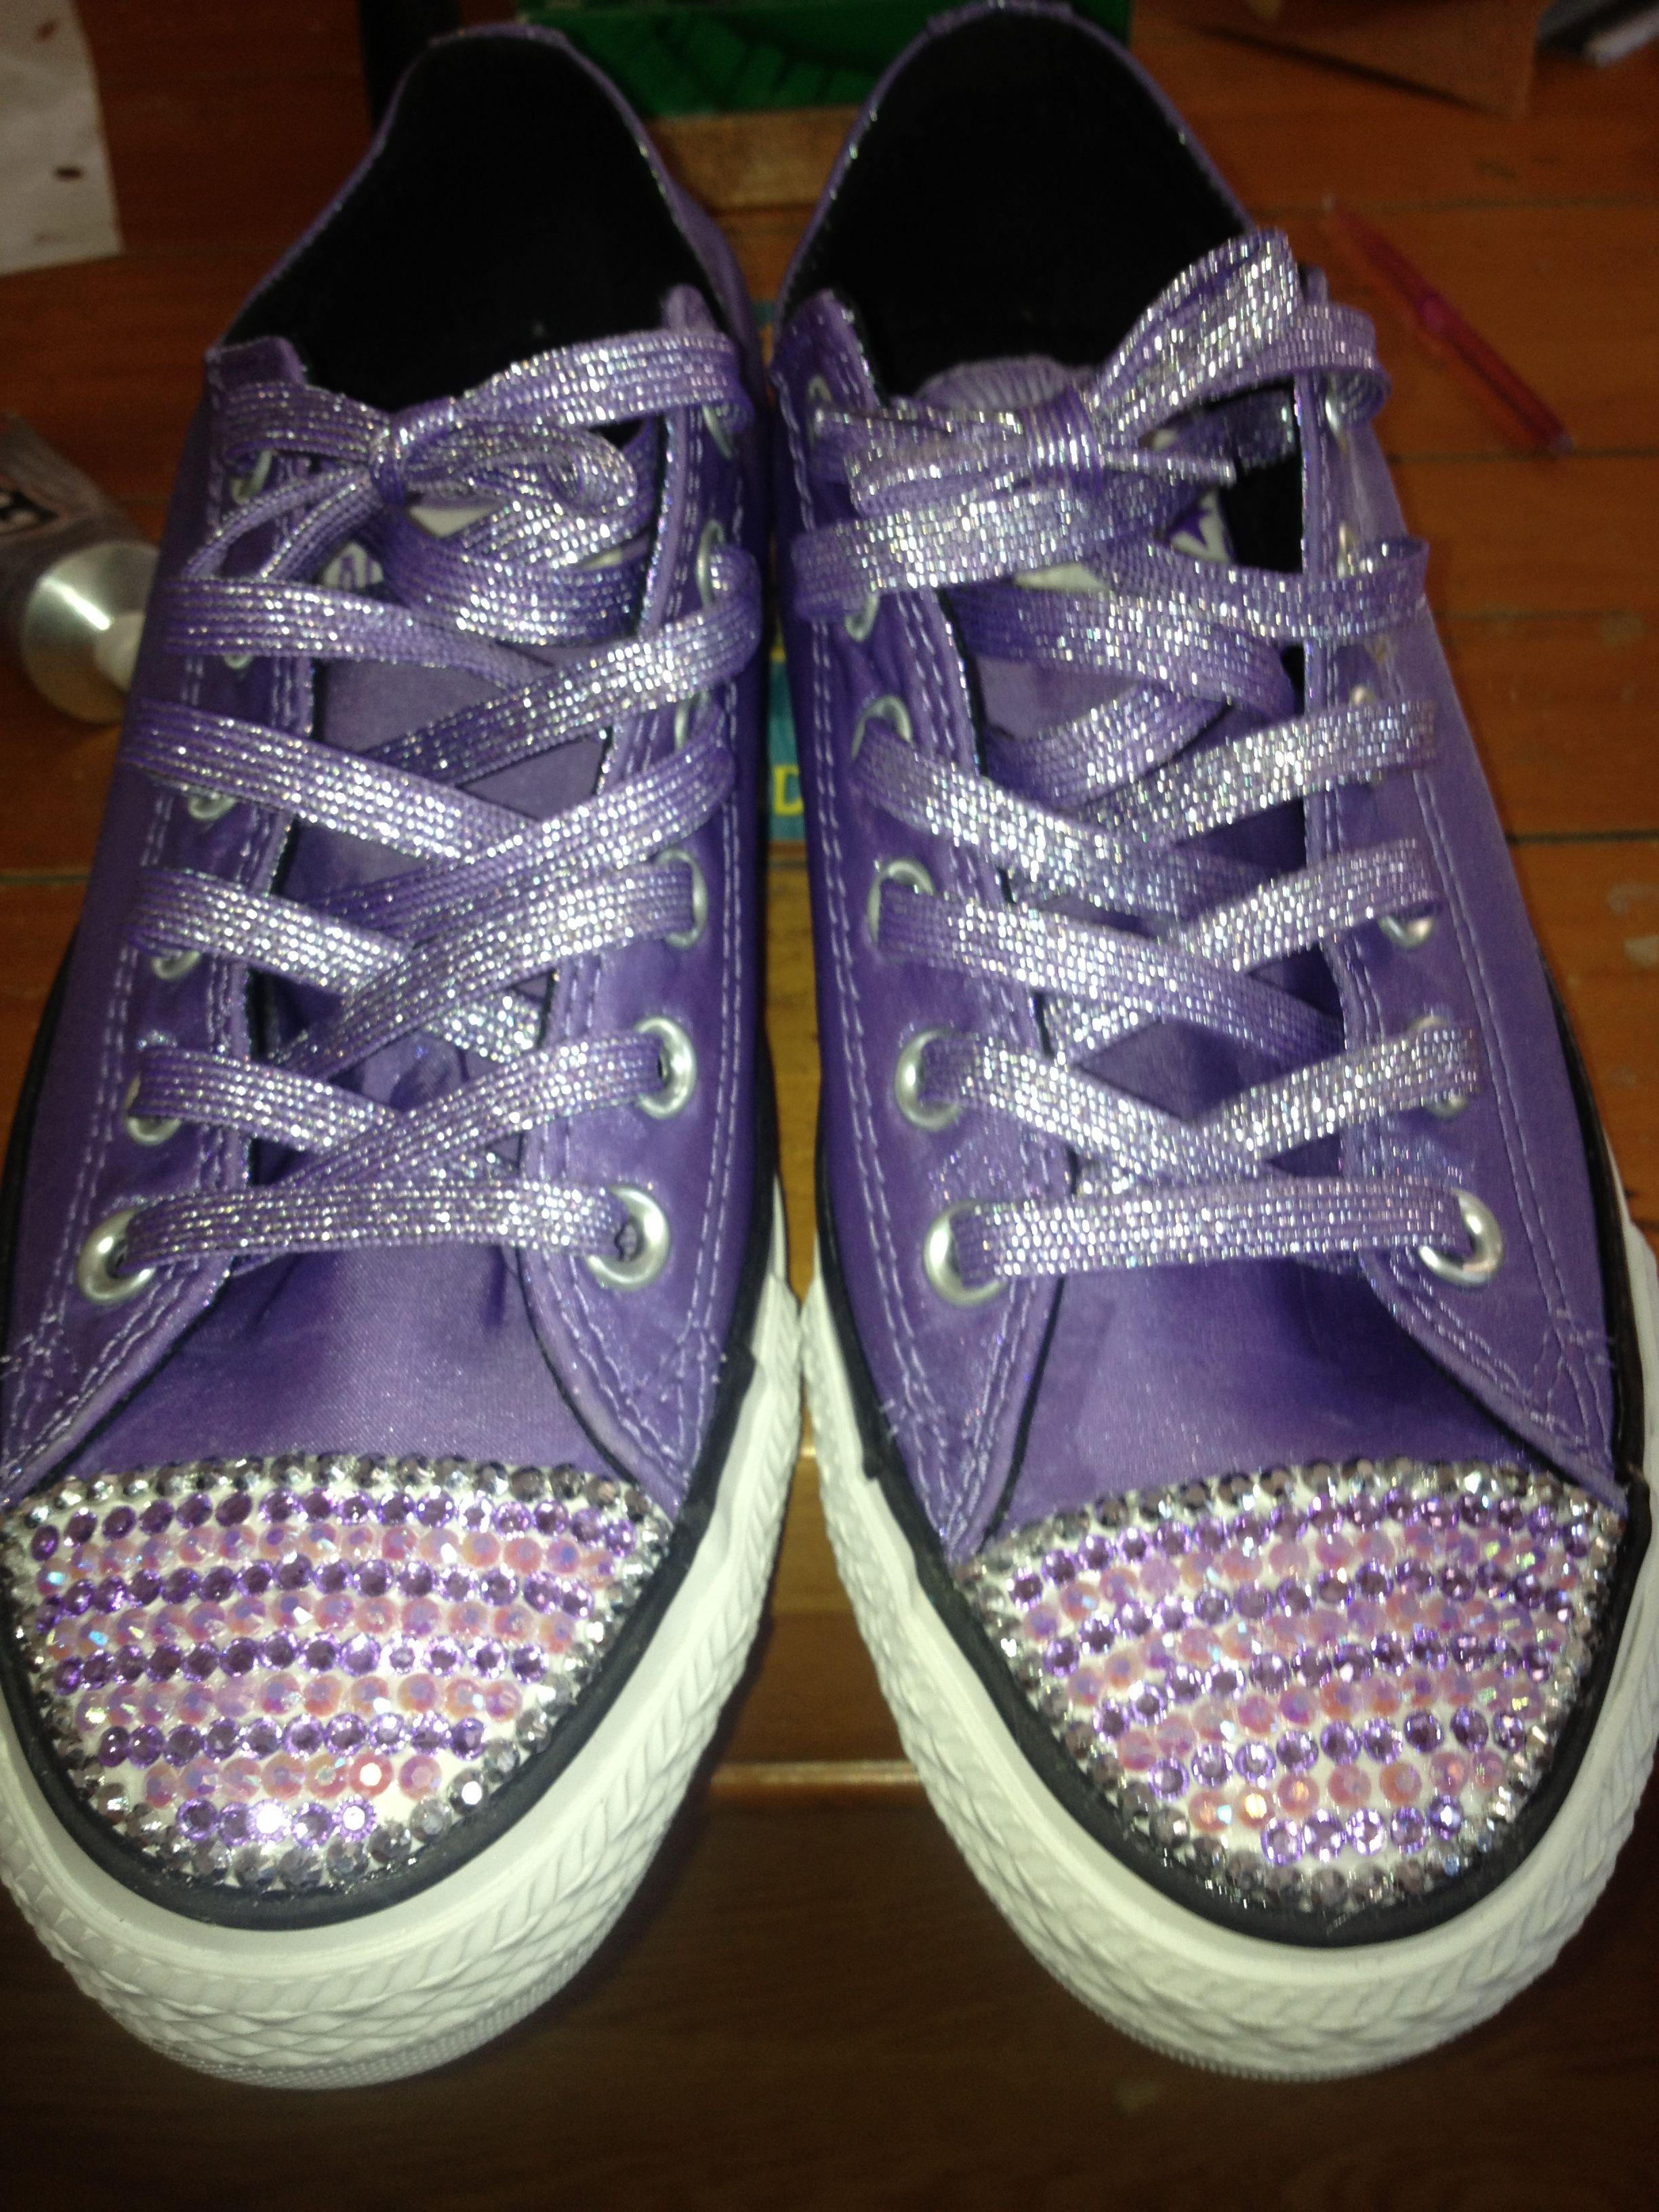 Diy Rhinestone Converse Shoes Dress Up Shoe Ideas 148b48691